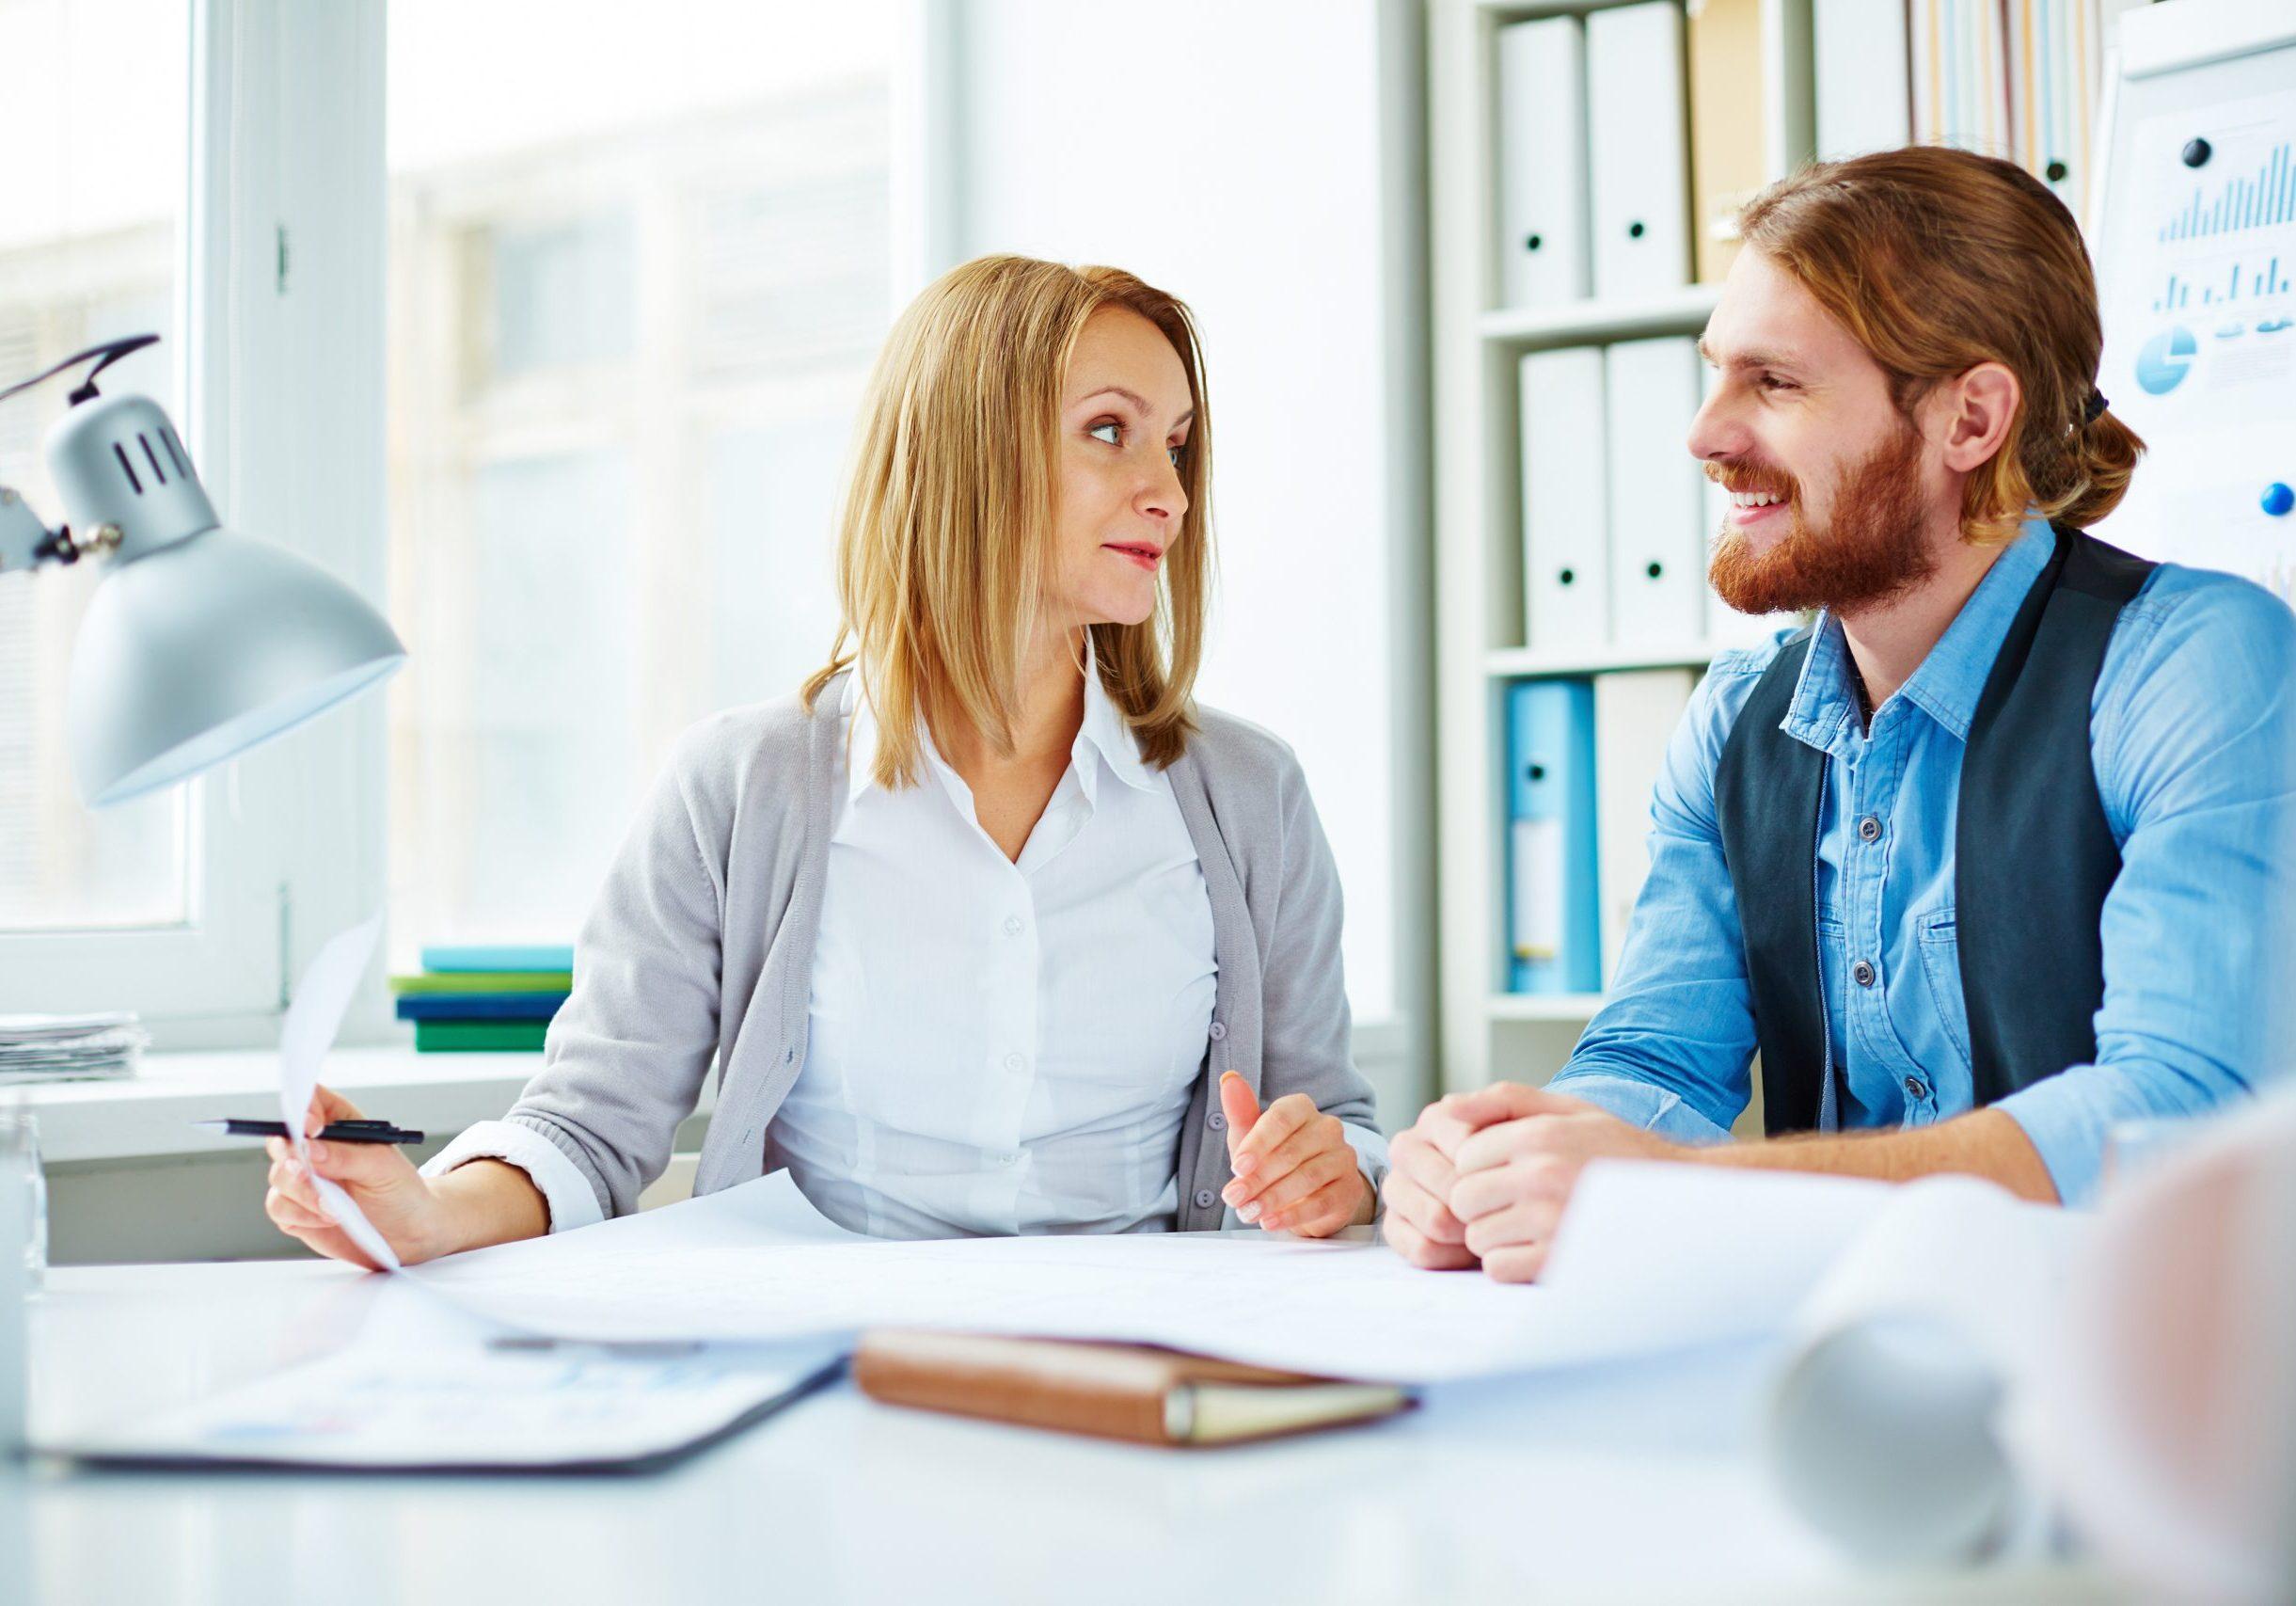 Two business people talking in office